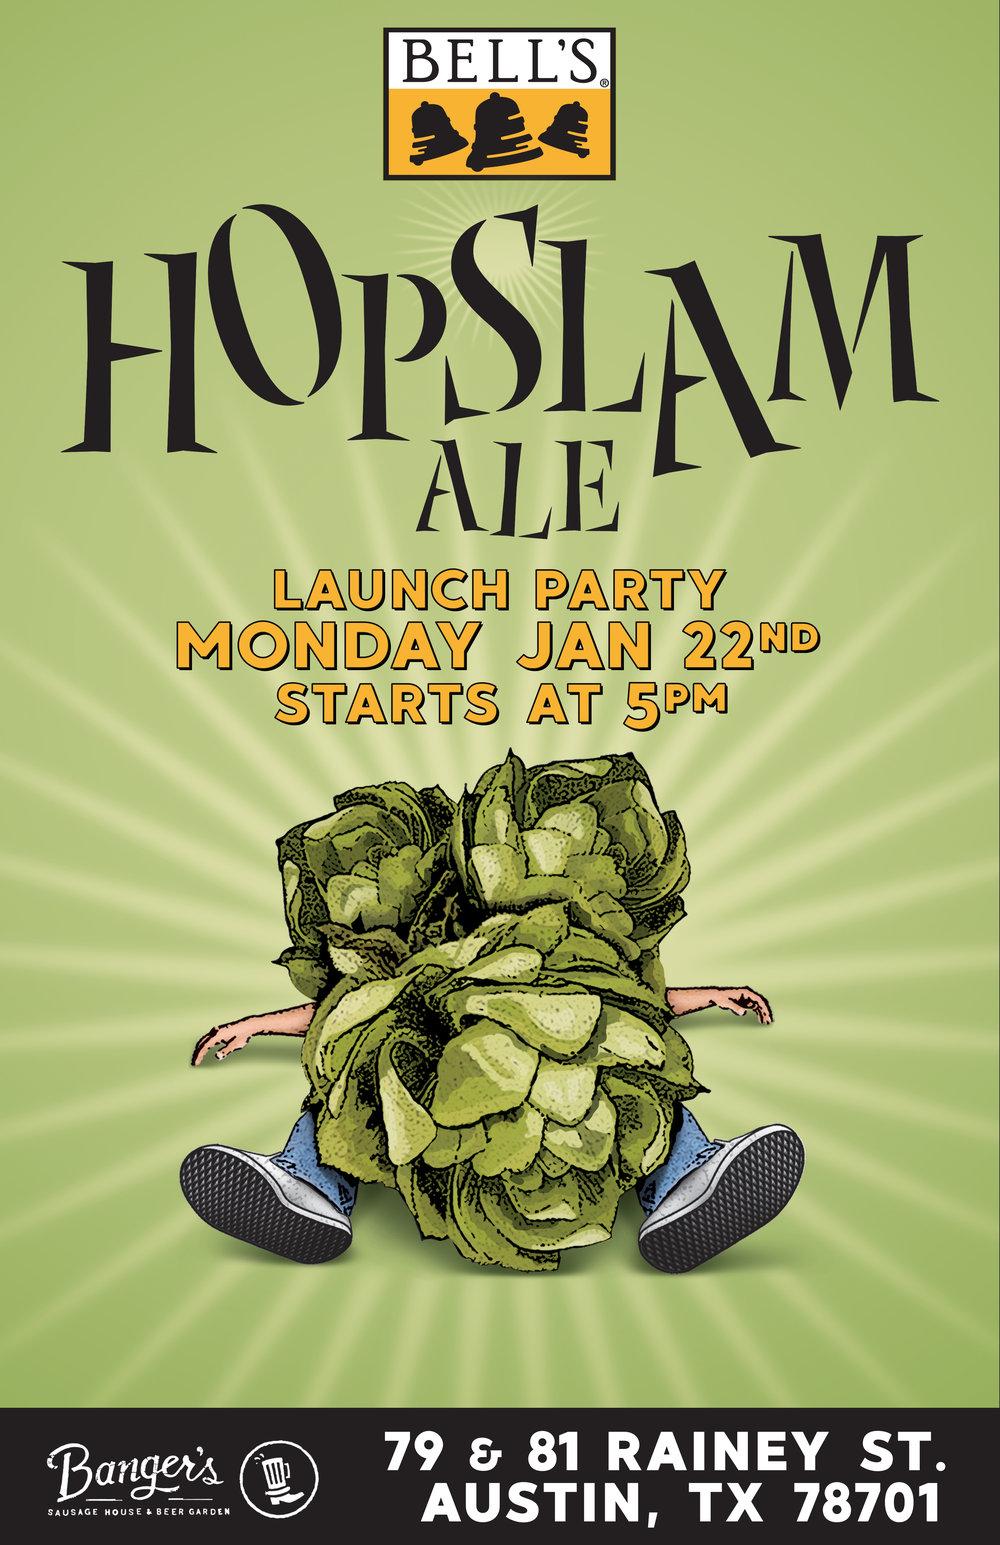 Hopslam_Event_Poster.jpg